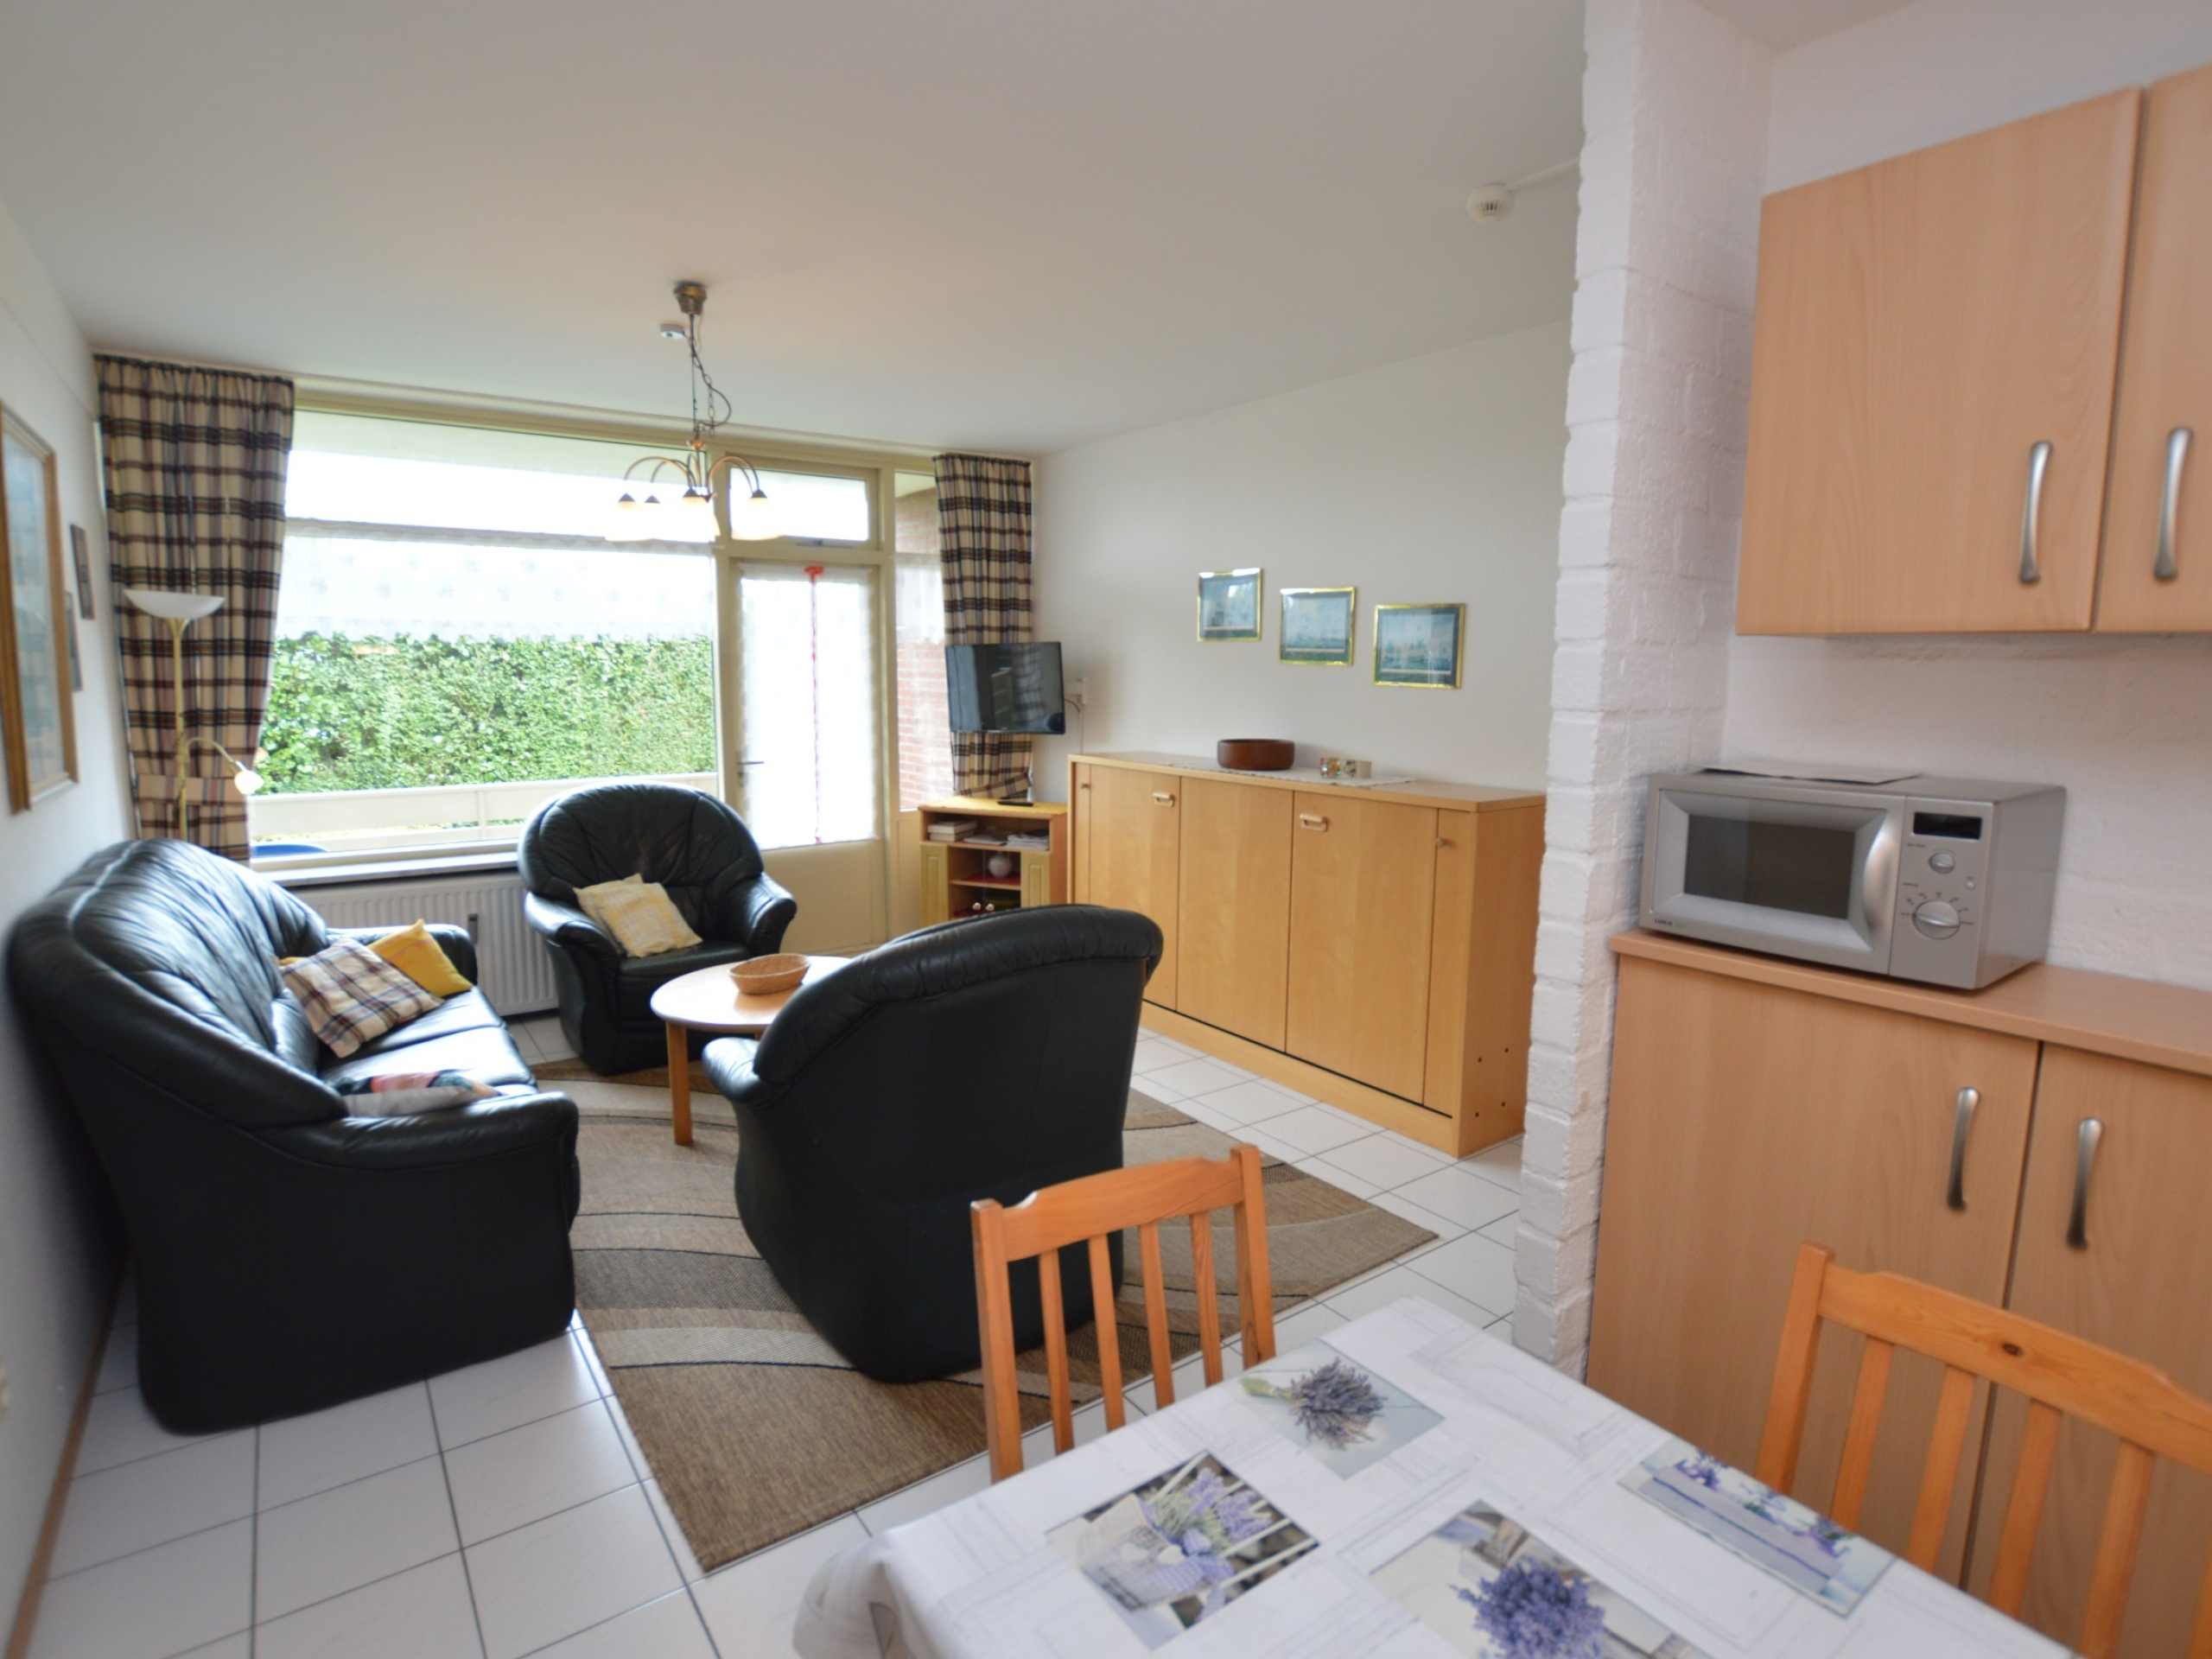 Fully furnished apartment with wonderful terrace near De Koog